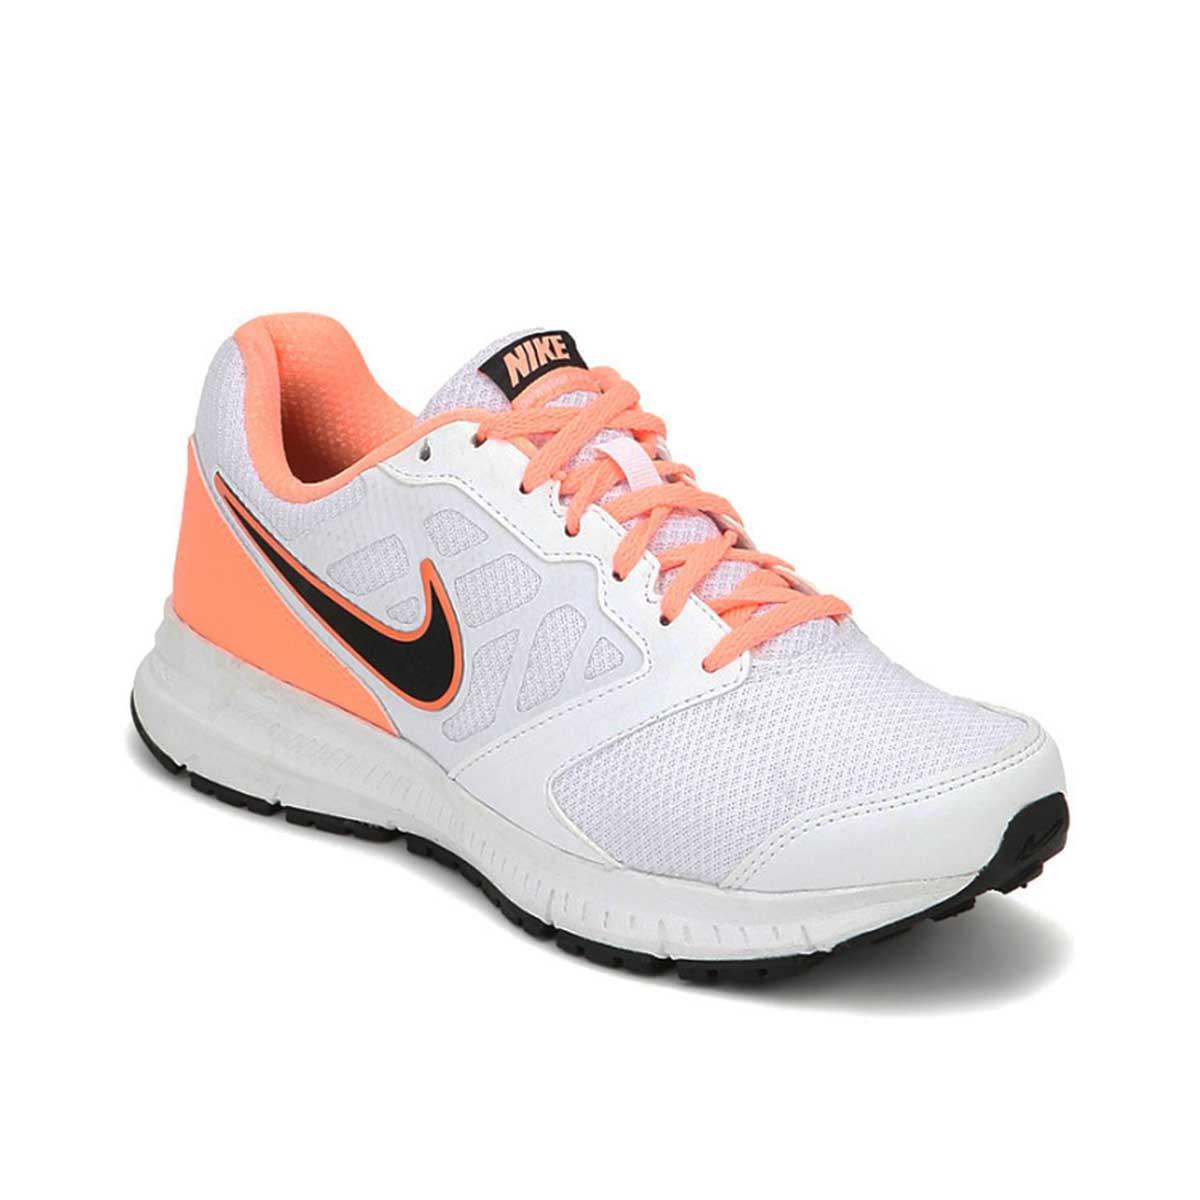 af23de1ffc34 Buy Nike Downshifter 6 Womens Running Shoes (White Pink) Online